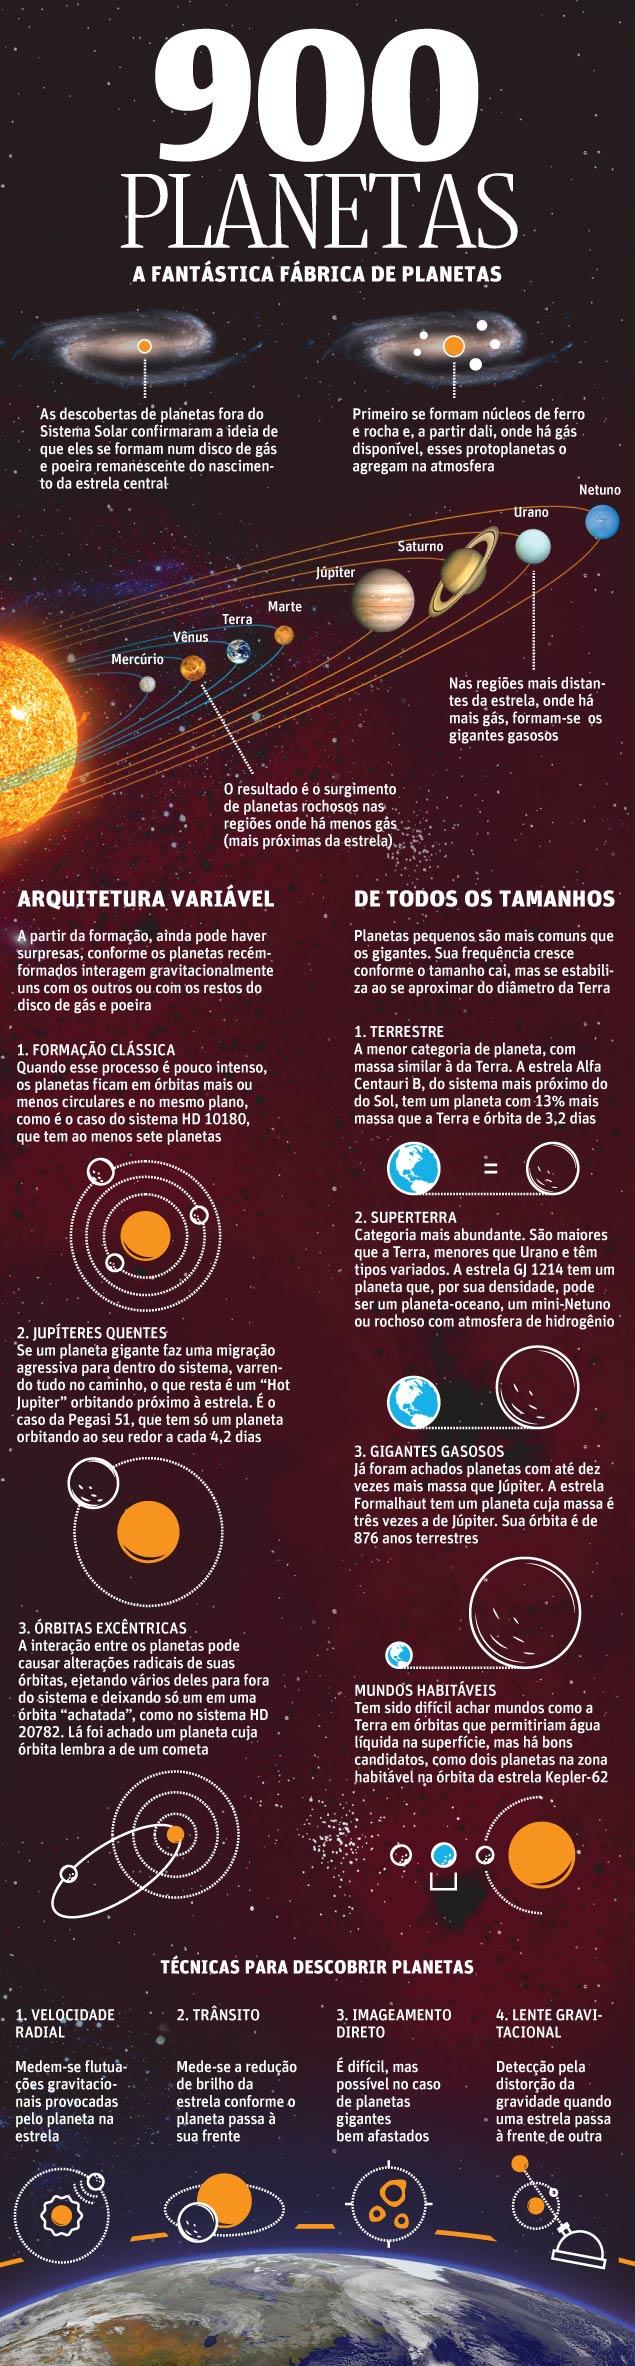 Notícias Astronômicas - Página 2 13122874